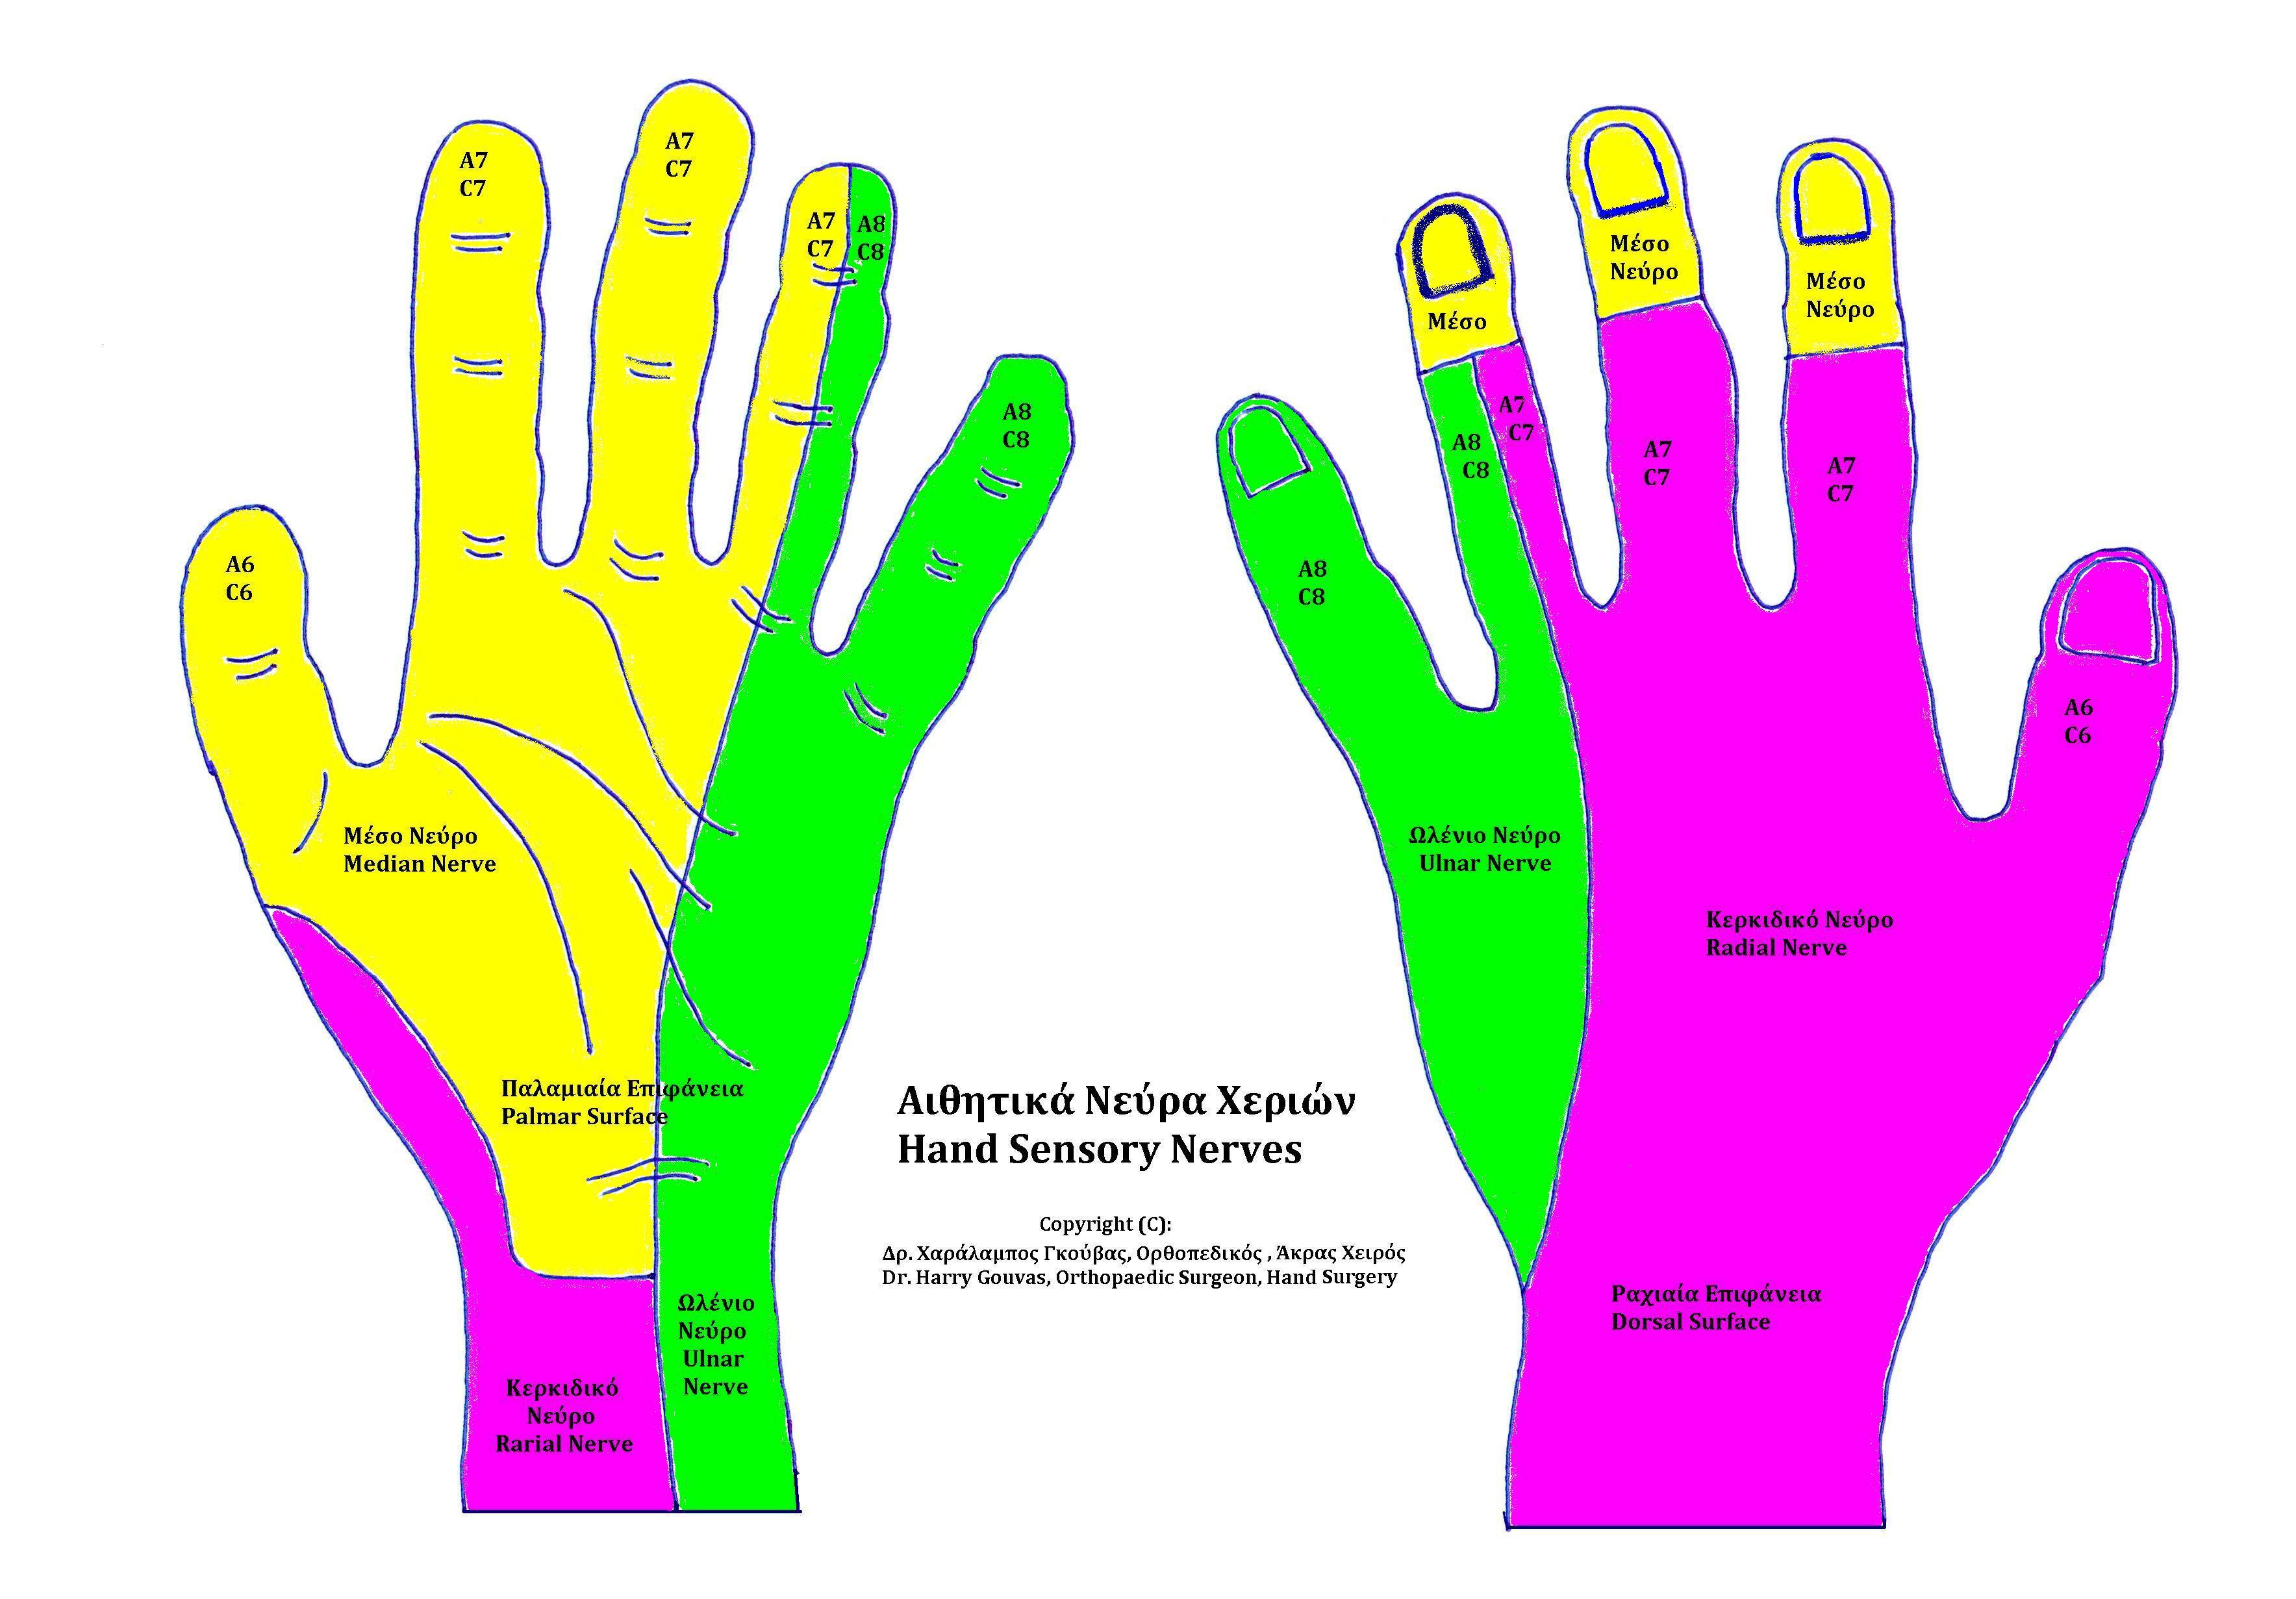 File:Hand Sensory Nerves.jpg - Wikimedia Commons